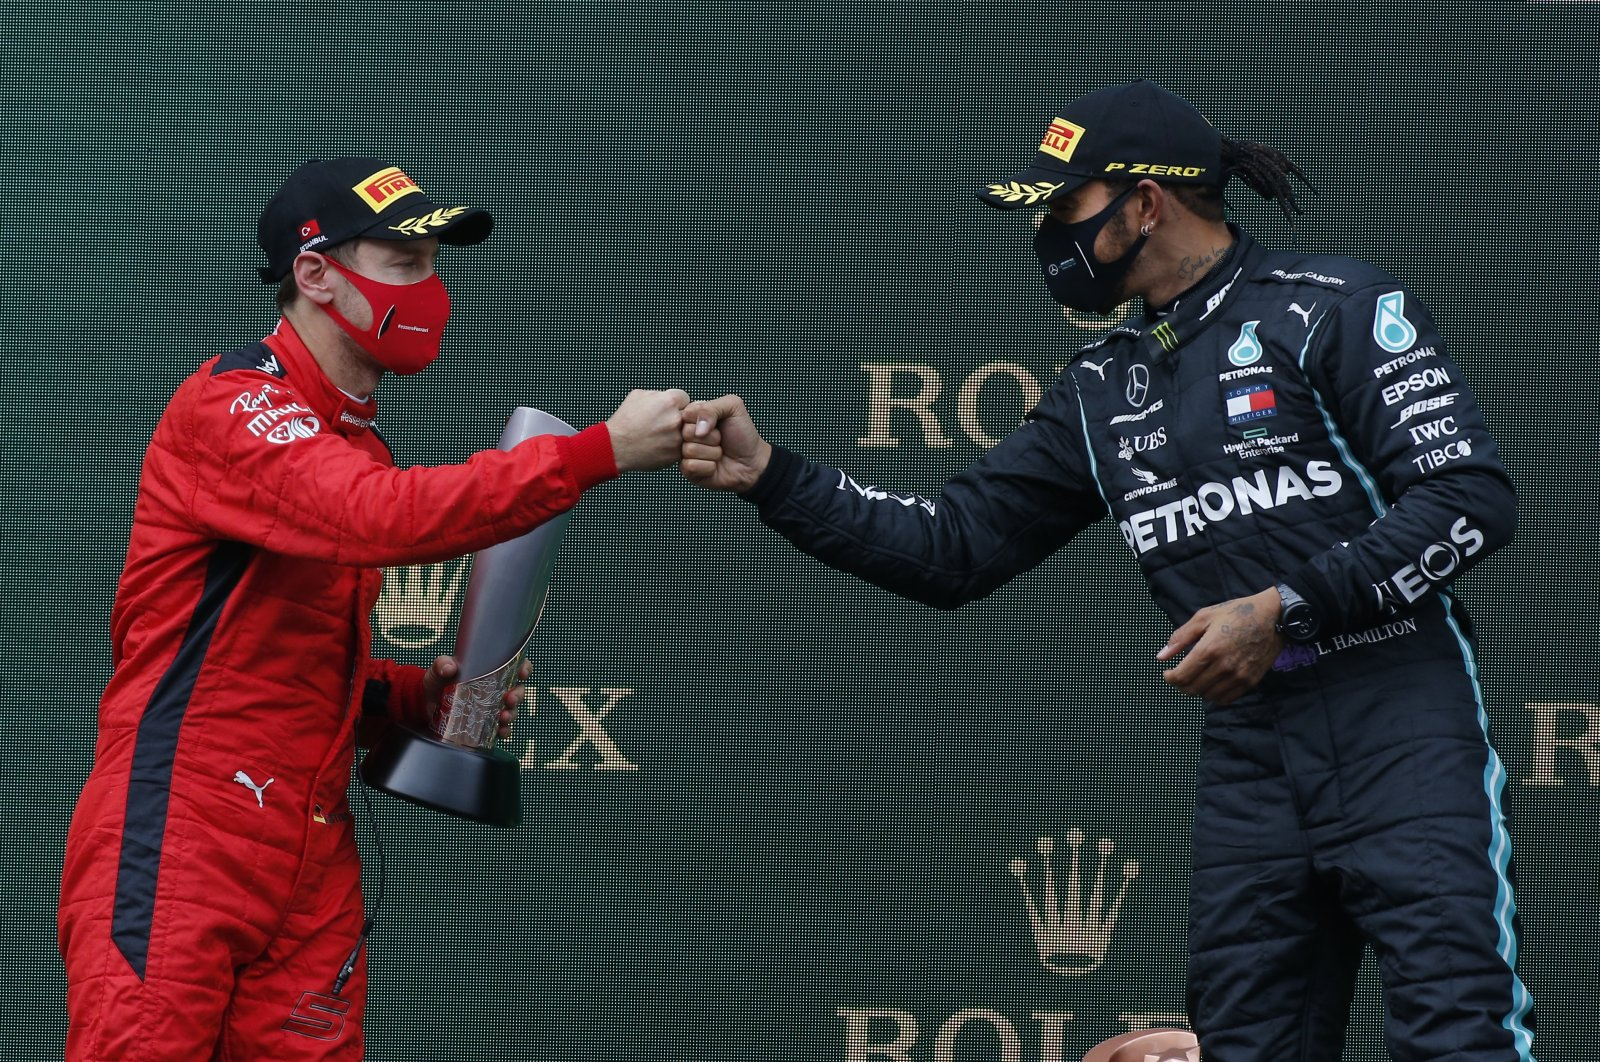 Ferrari driver Sebastian Vettel (L) and Mercedes driver Lewis Hamilton bump fists after the Formula One Turkish Grand Prix in Istanbul, Turkey, Nov. 15 , 2020. (AP Photo)